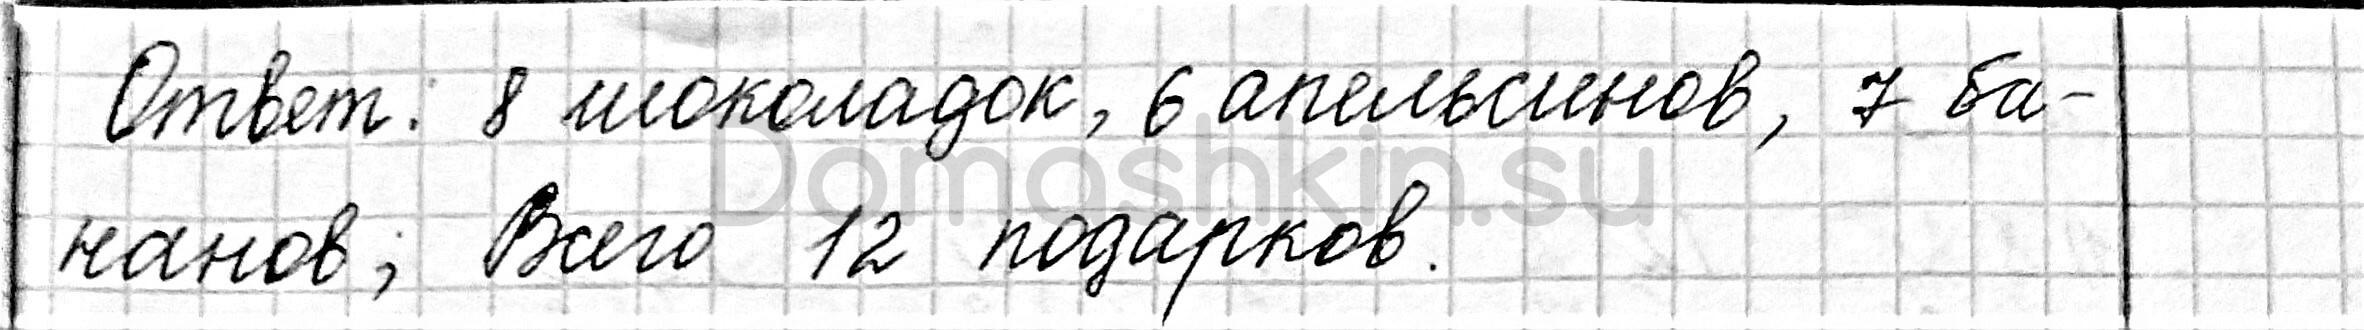 Математика 6 класс учебник Мерзляк номер 155 решение